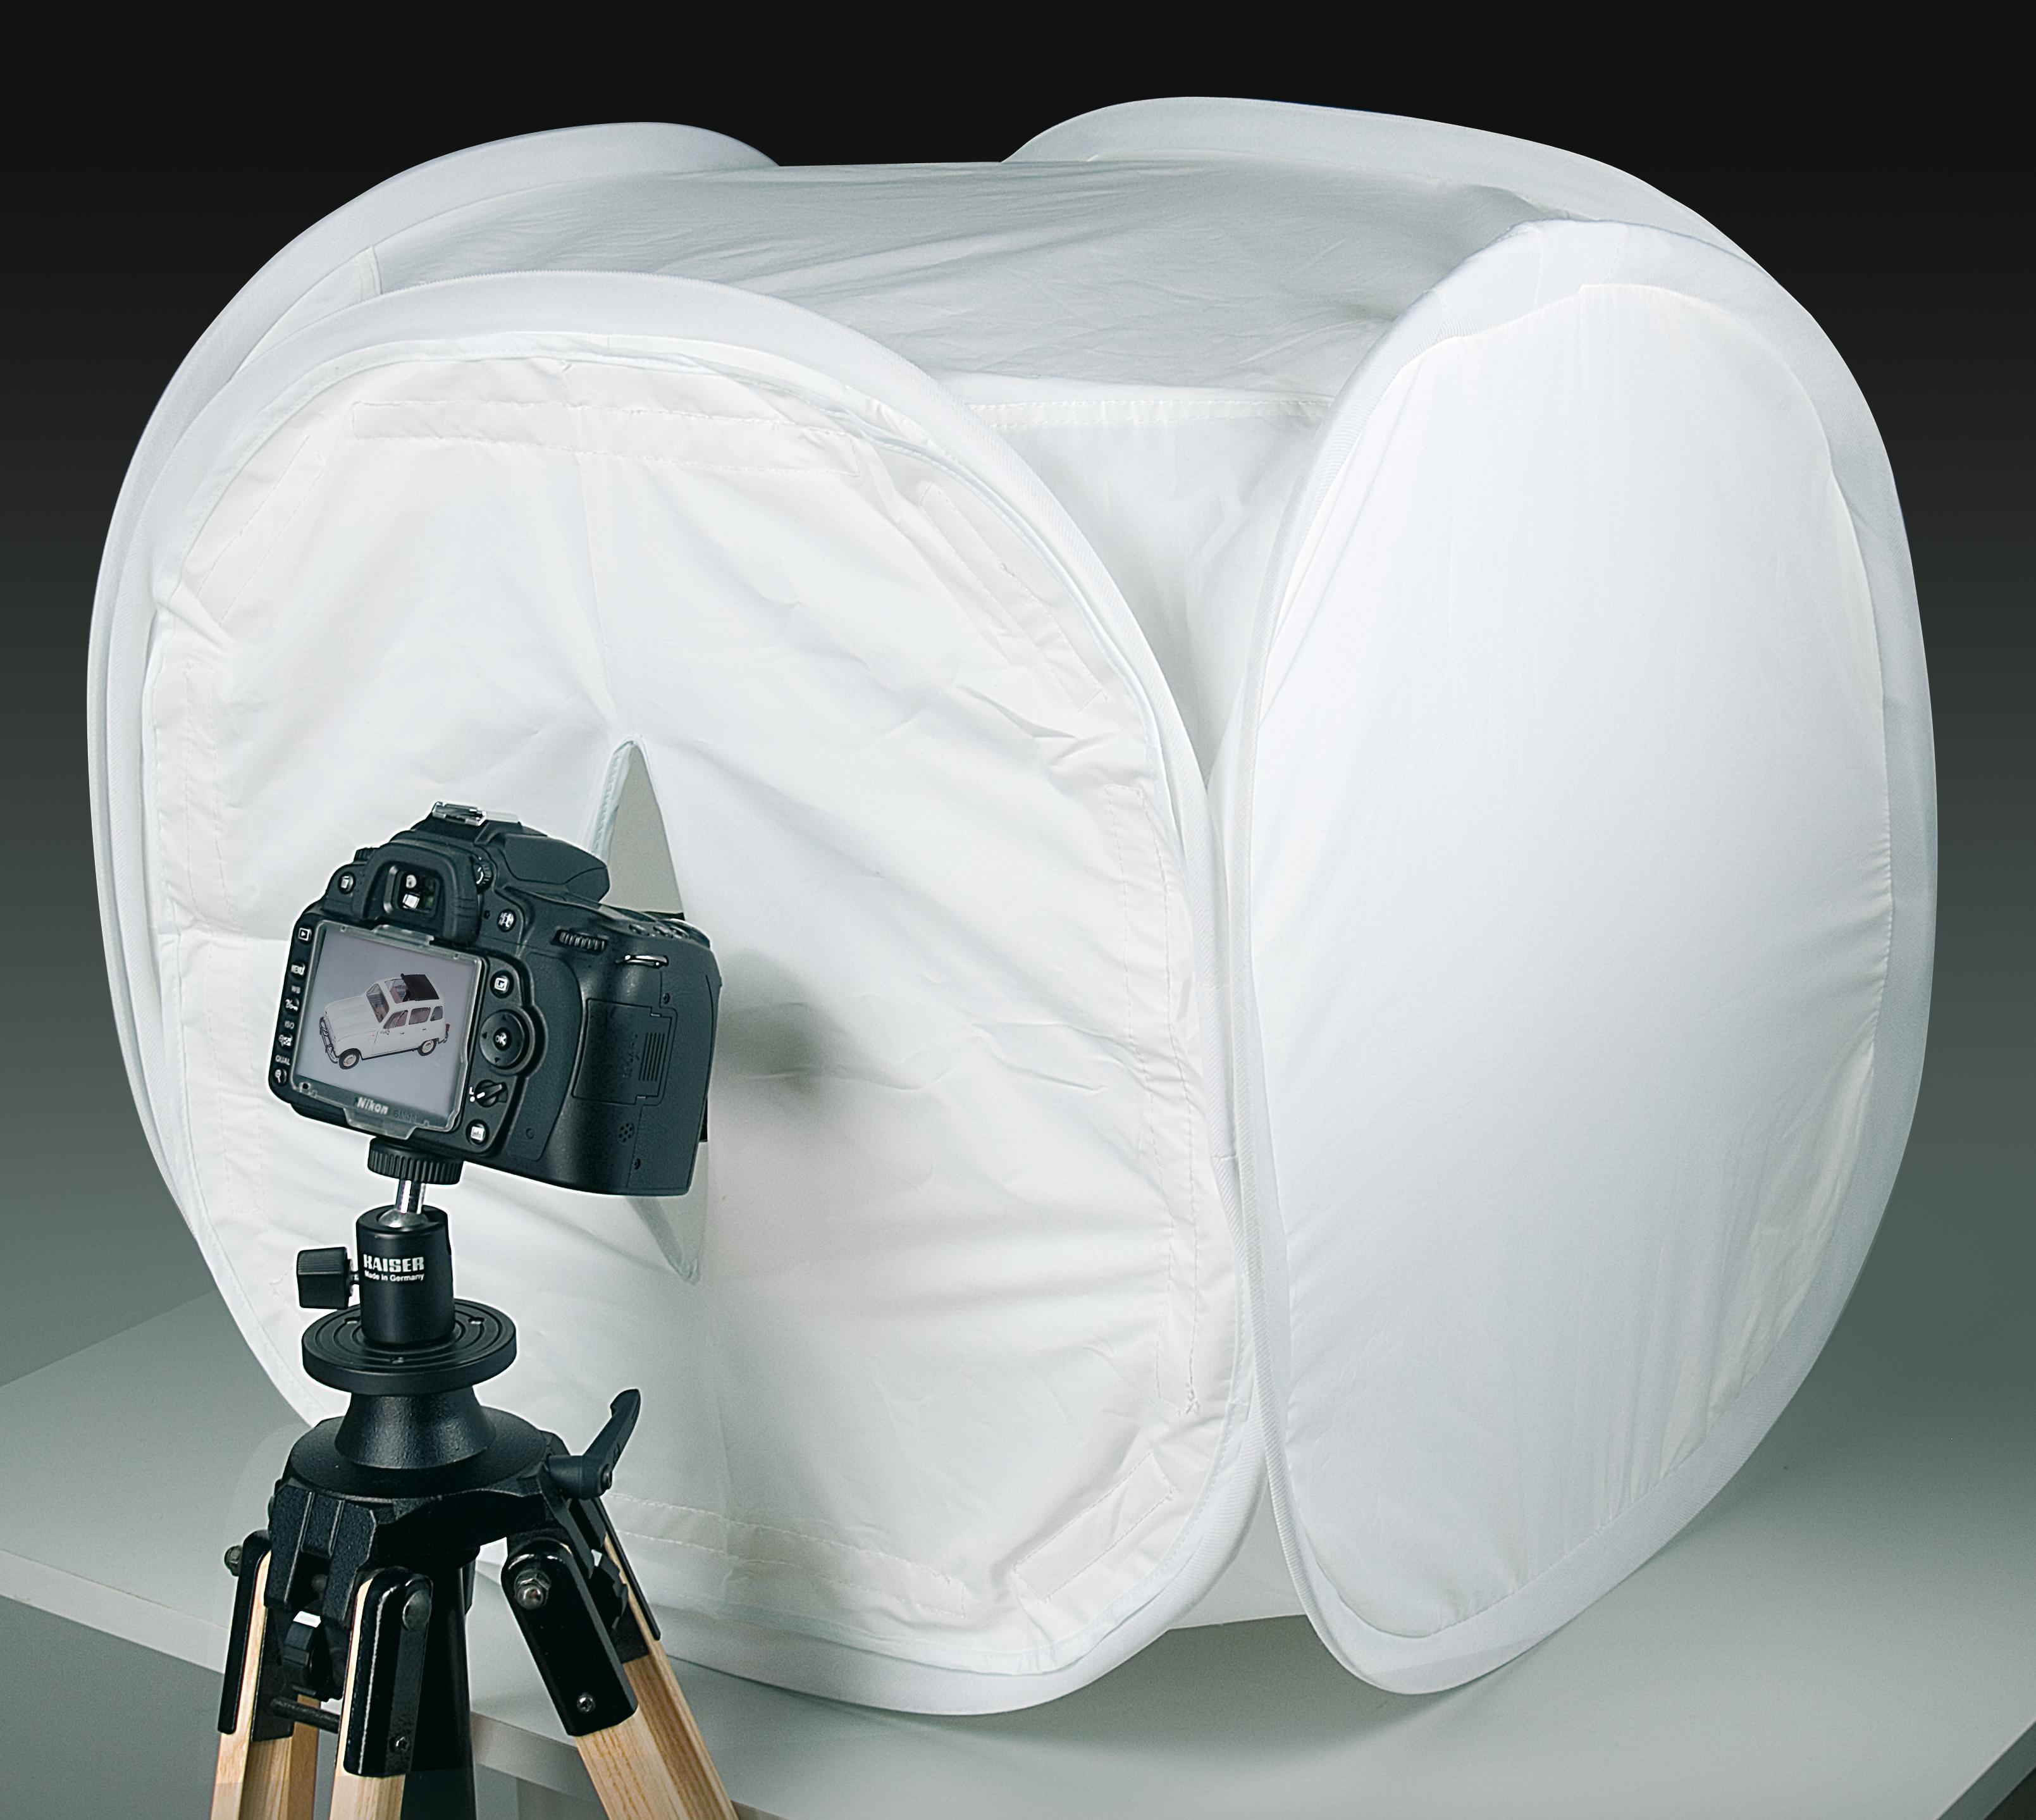 KAISER Desktop-Aufnahme-Set mit Cube-Studio 50x50x50cm